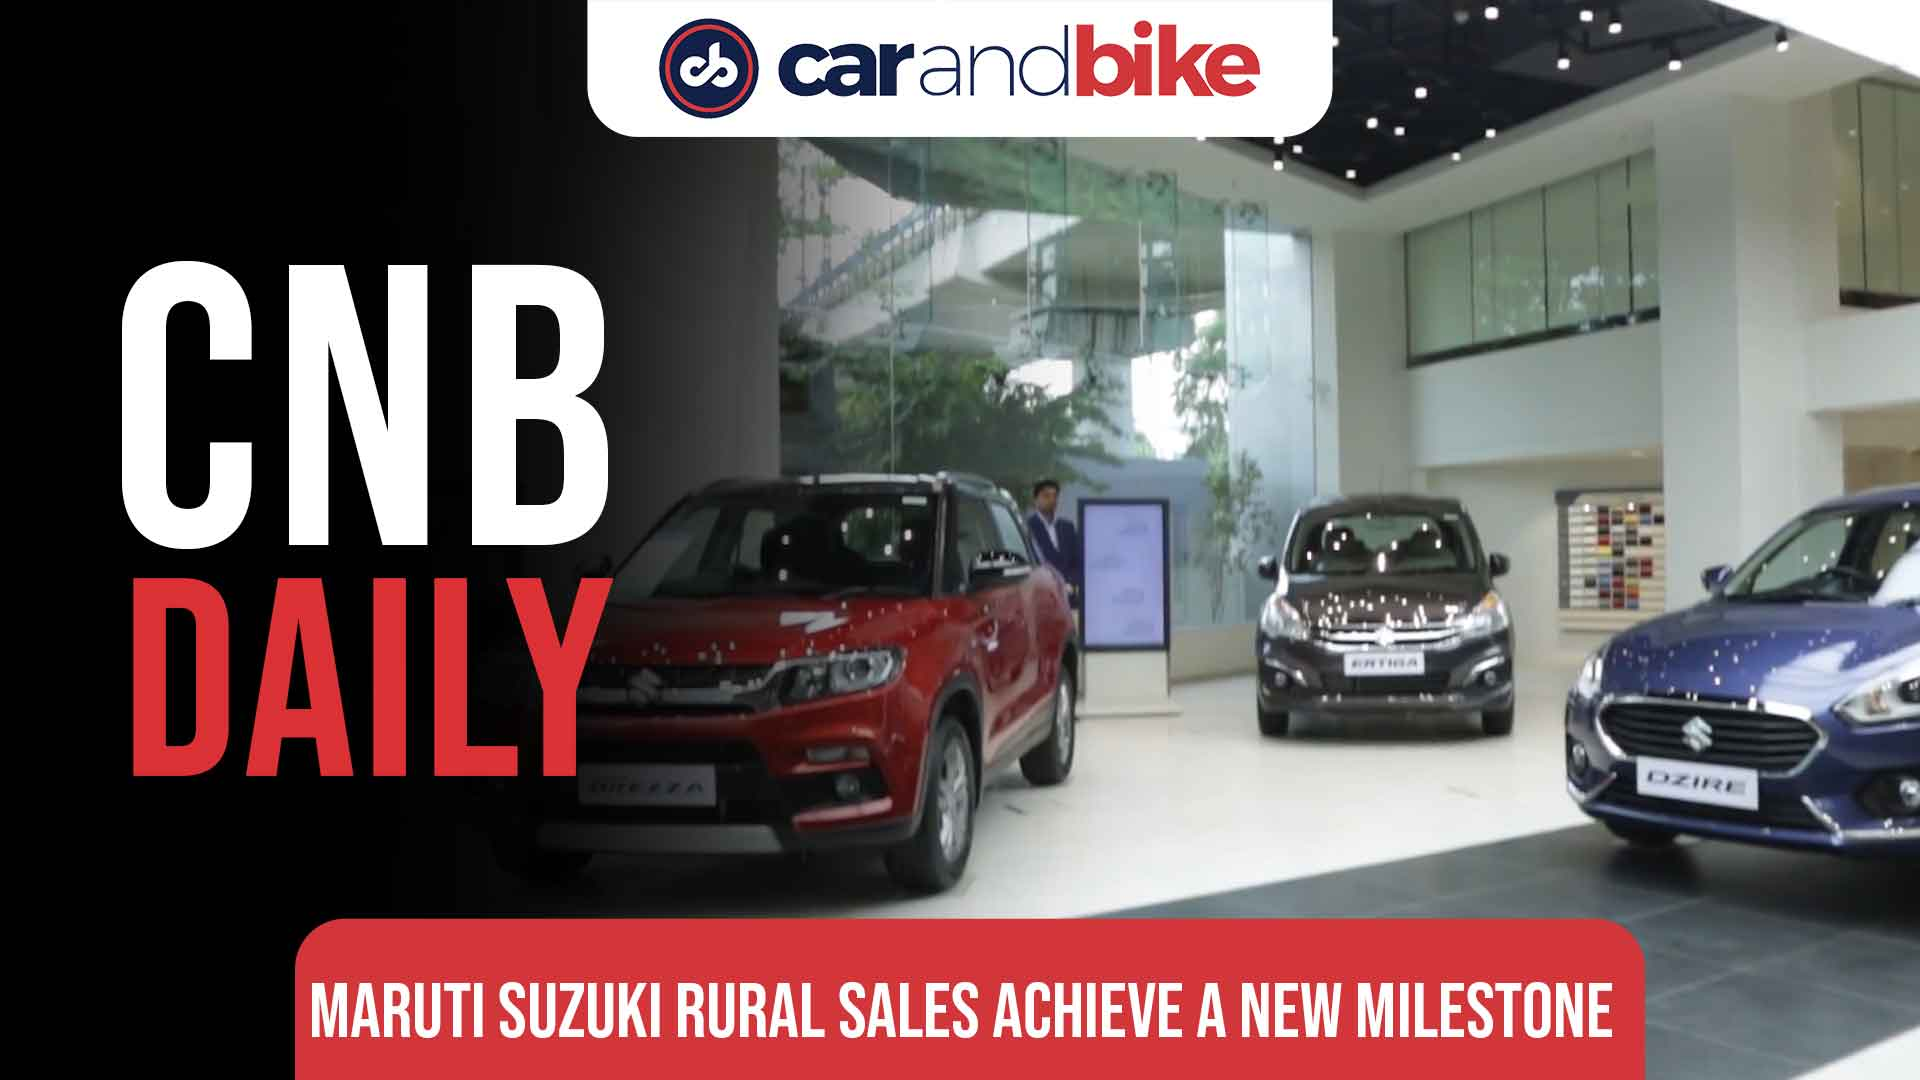 Maruti Suzuki's rural sales cross 50 lakh units